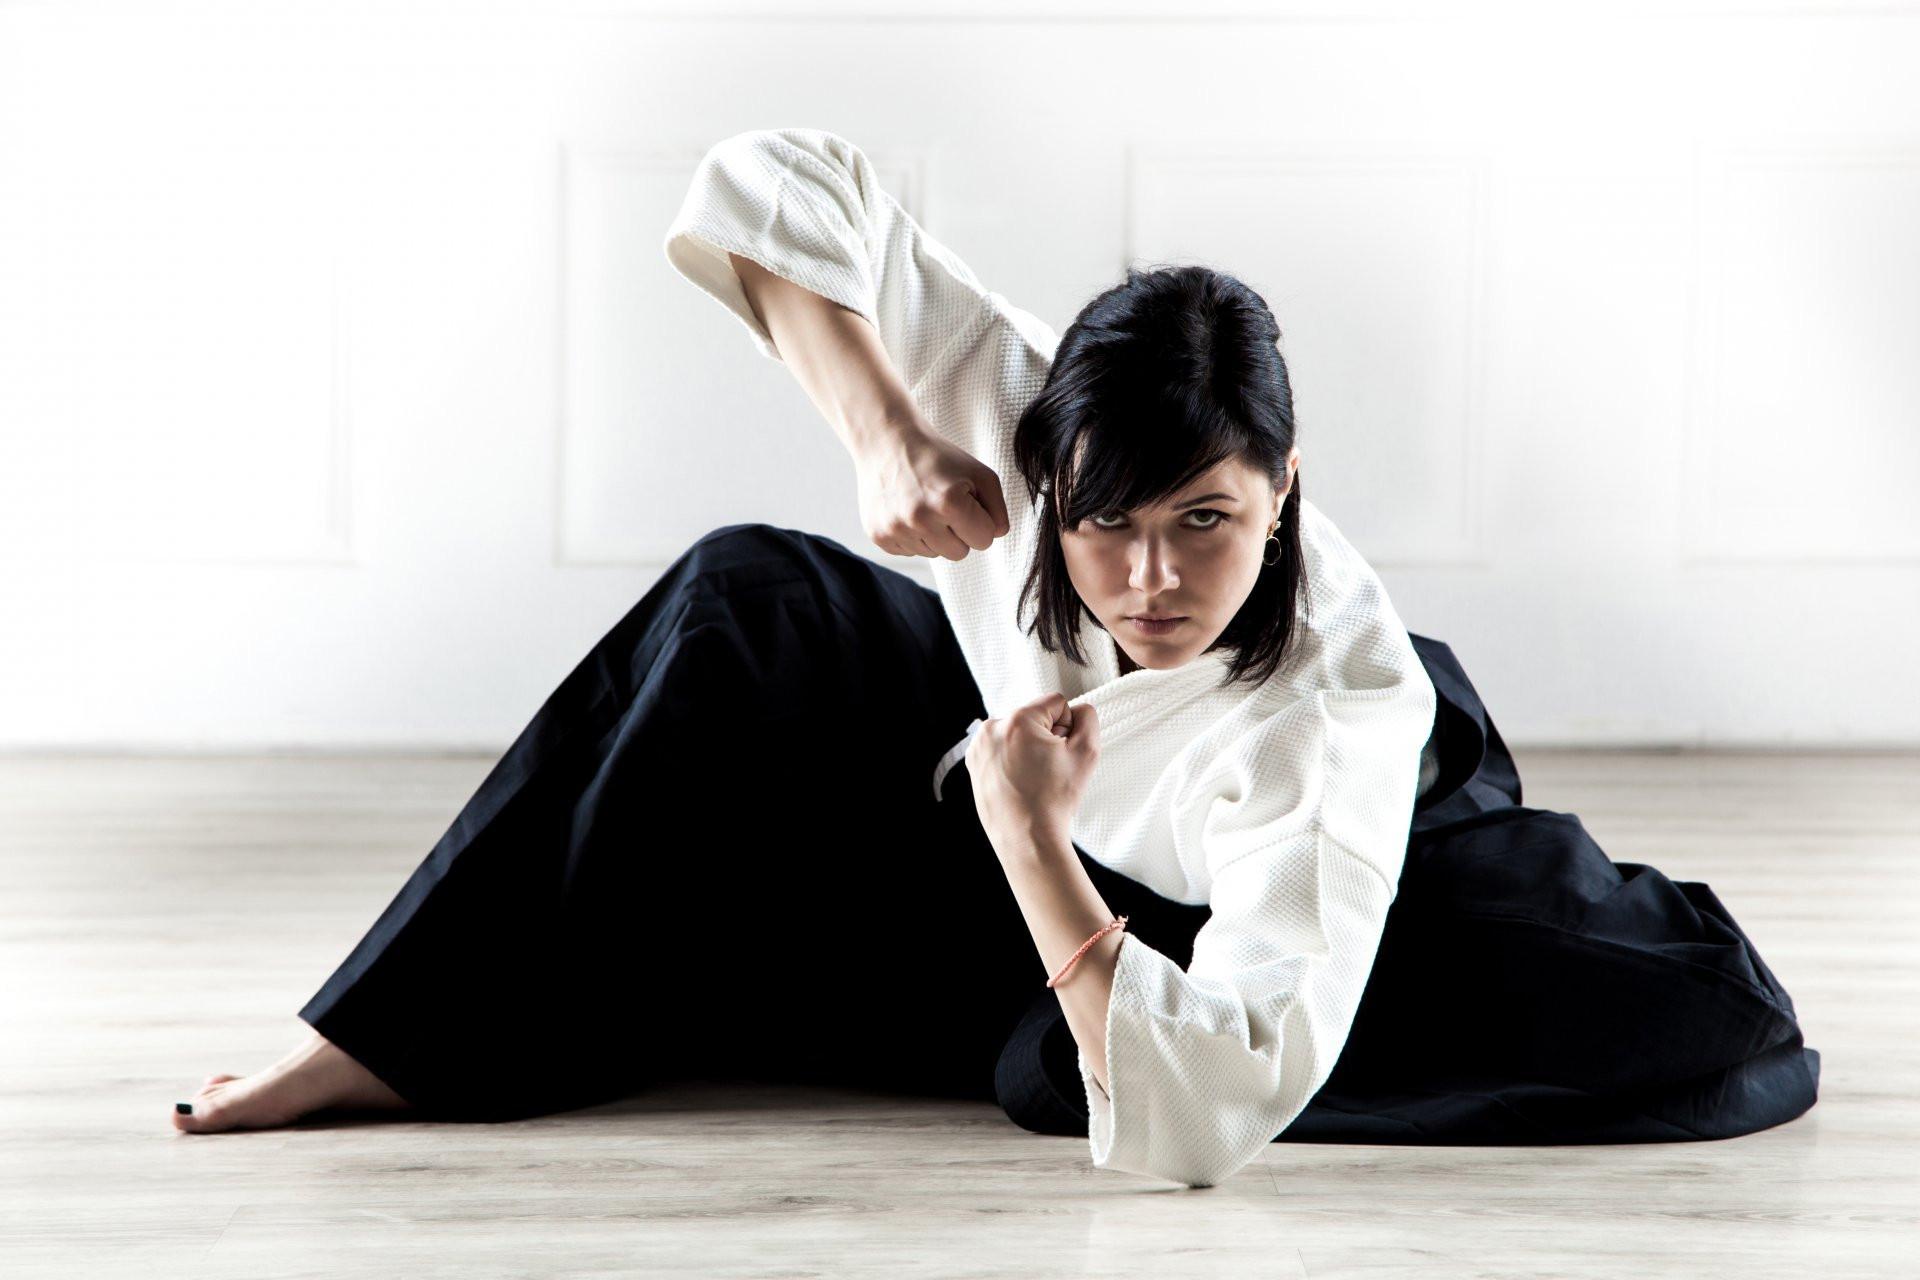 wallpaper.wiki-Aikido-Girl-Wallpaper-PIC-WPC002254.jpg